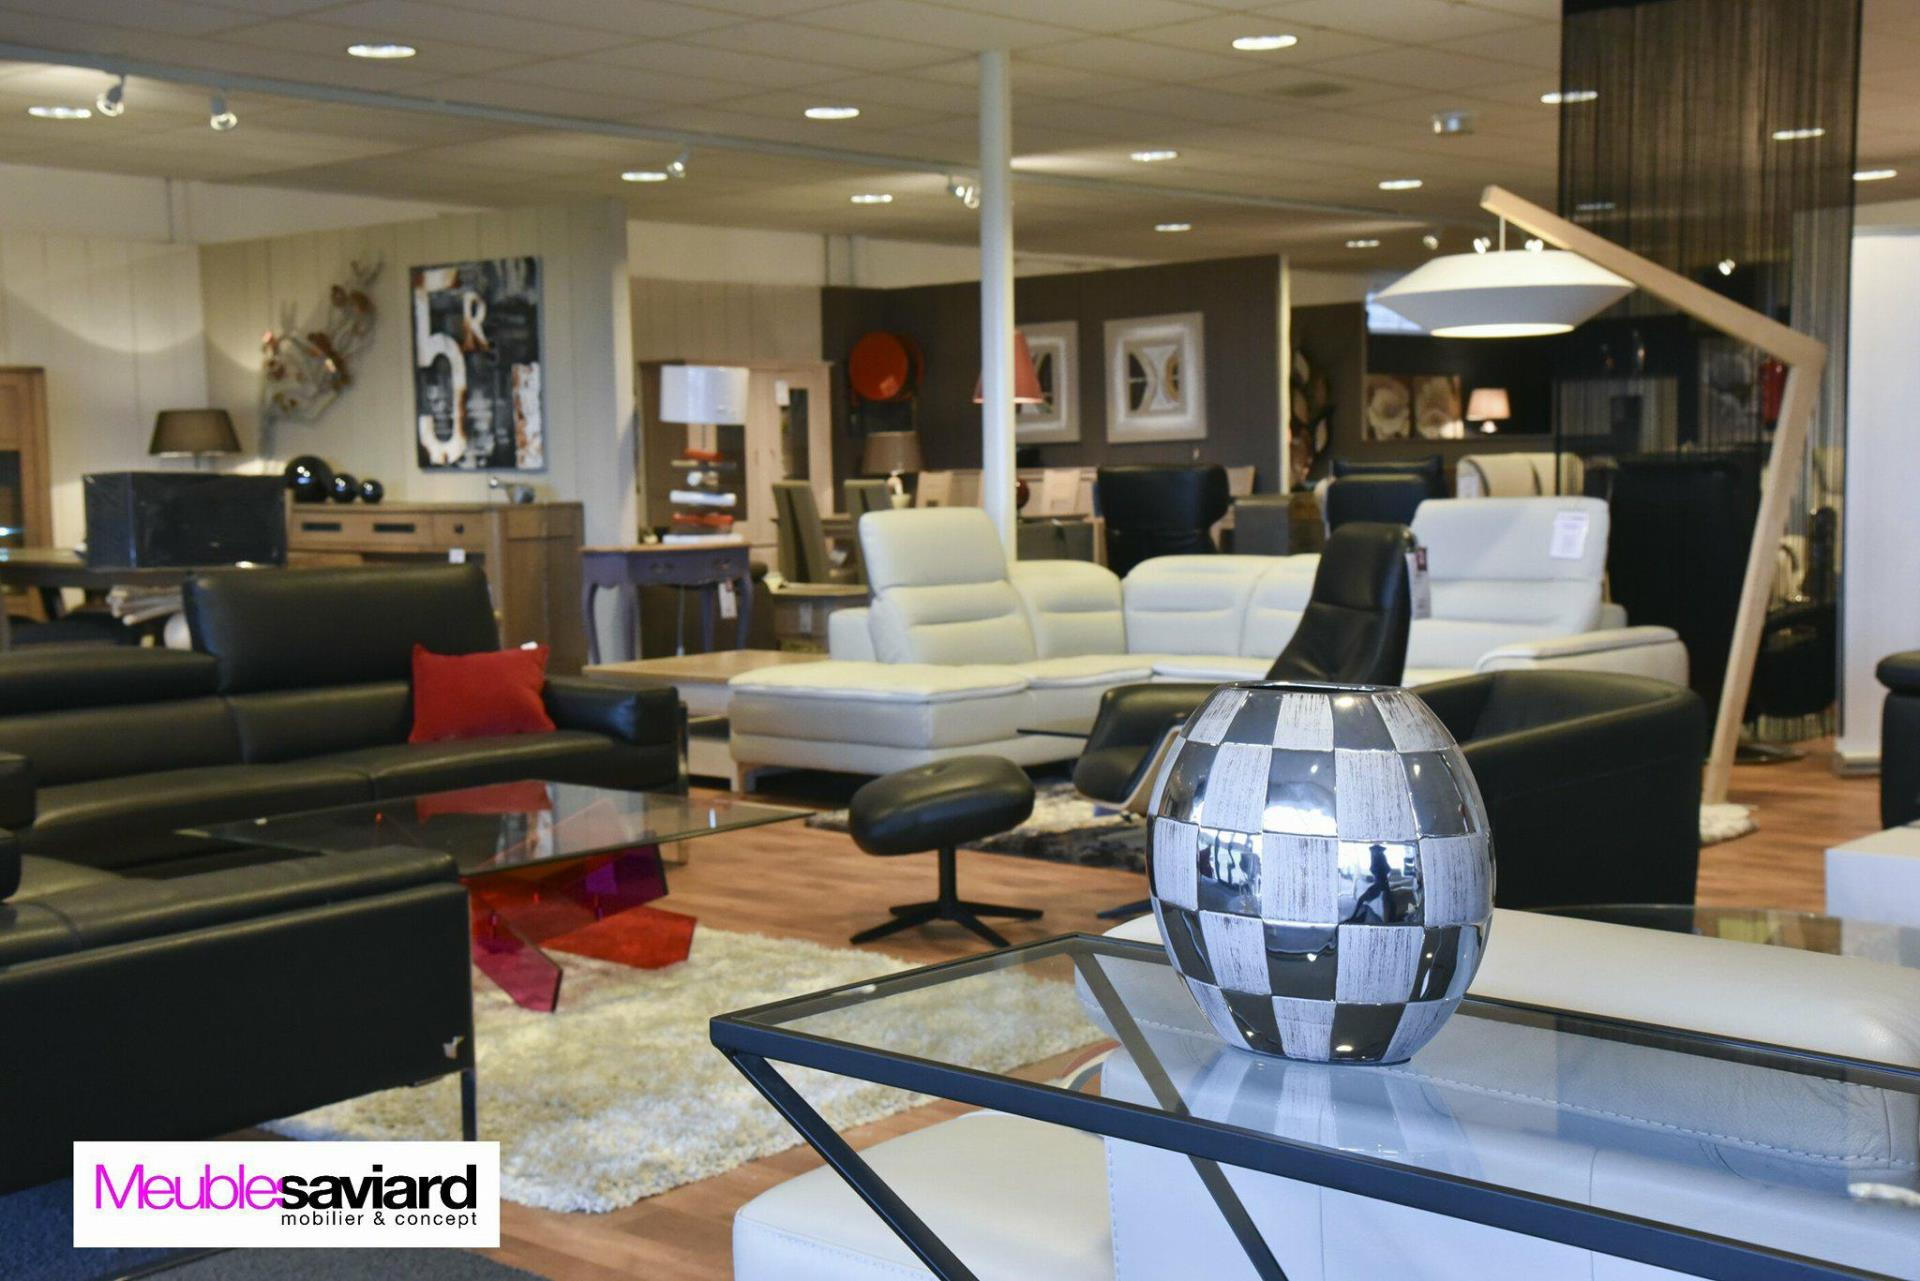 magasin meuble latest meubles de salon with magasin meuble elegant mobilier de france magasin. Black Bedroom Furniture Sets. Home Design Ideas